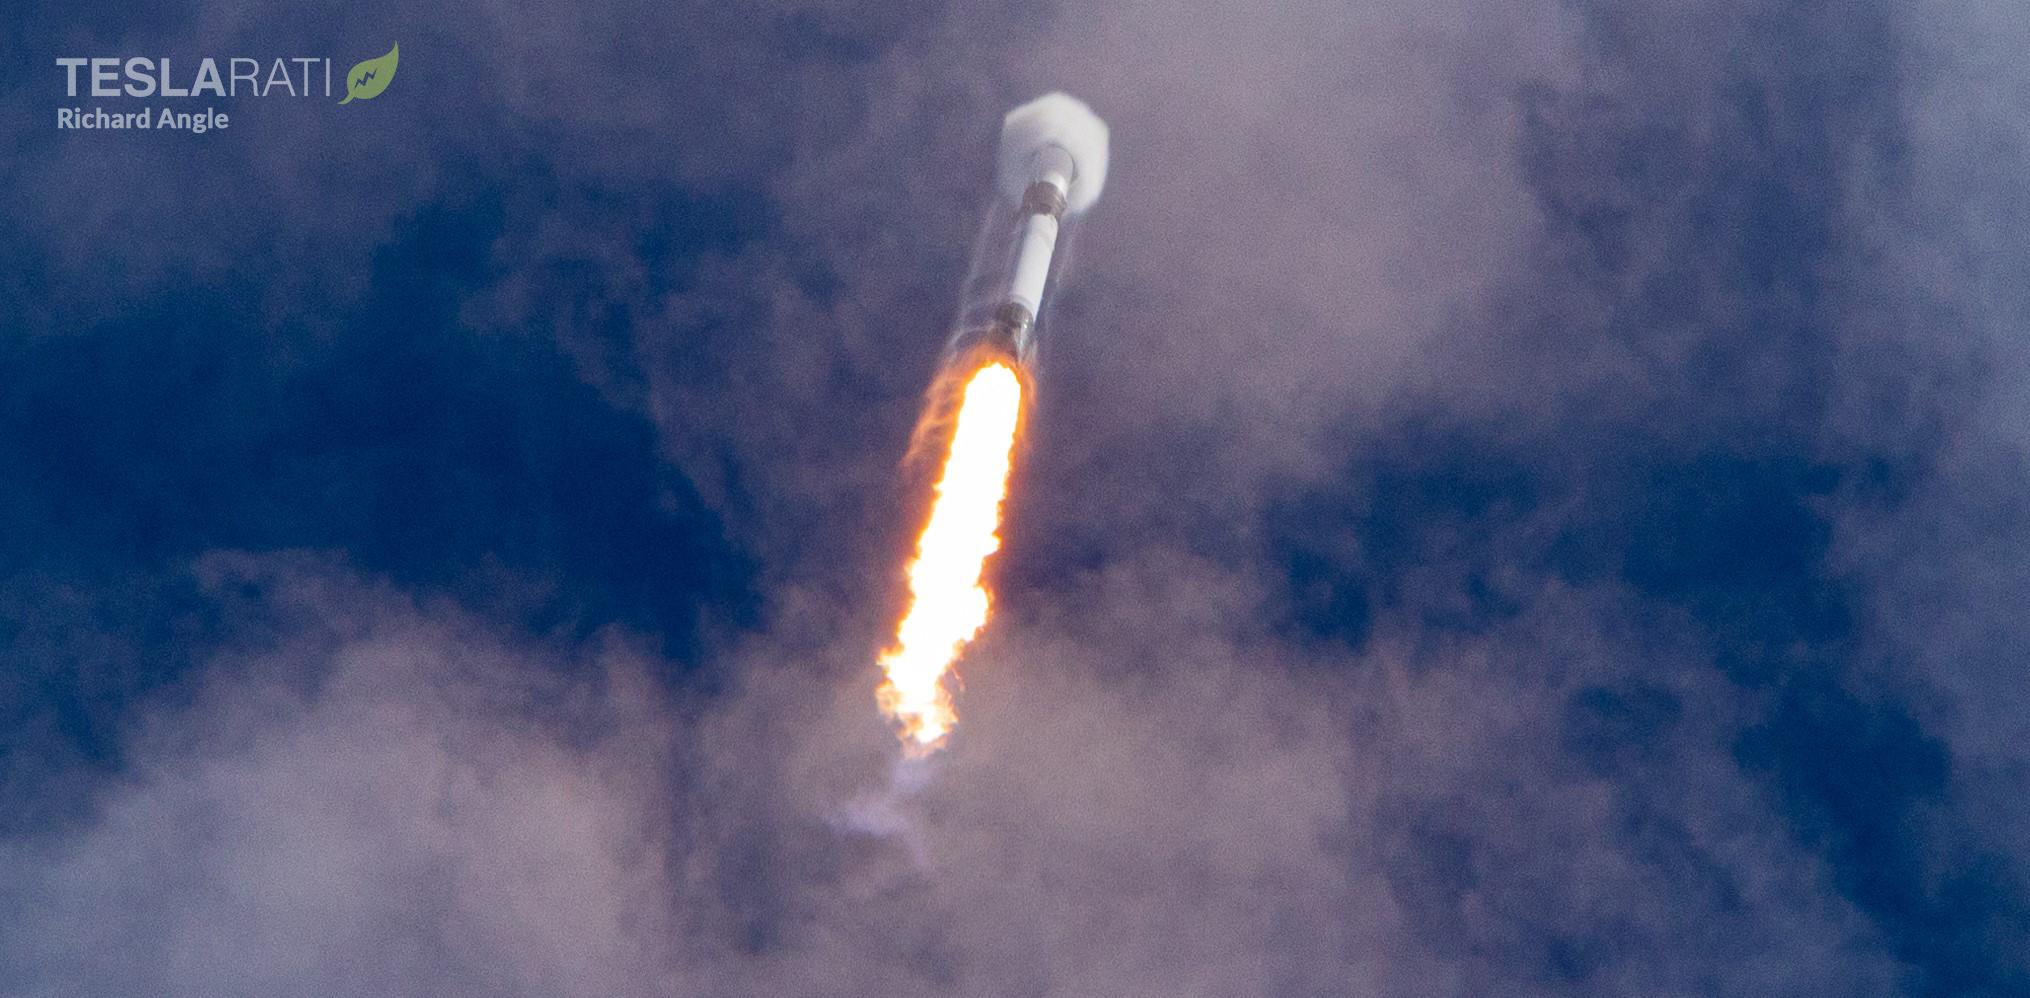 Starlink-10 SkySat Falcon 9 B1049 081820 (Richard Angle) launch 2